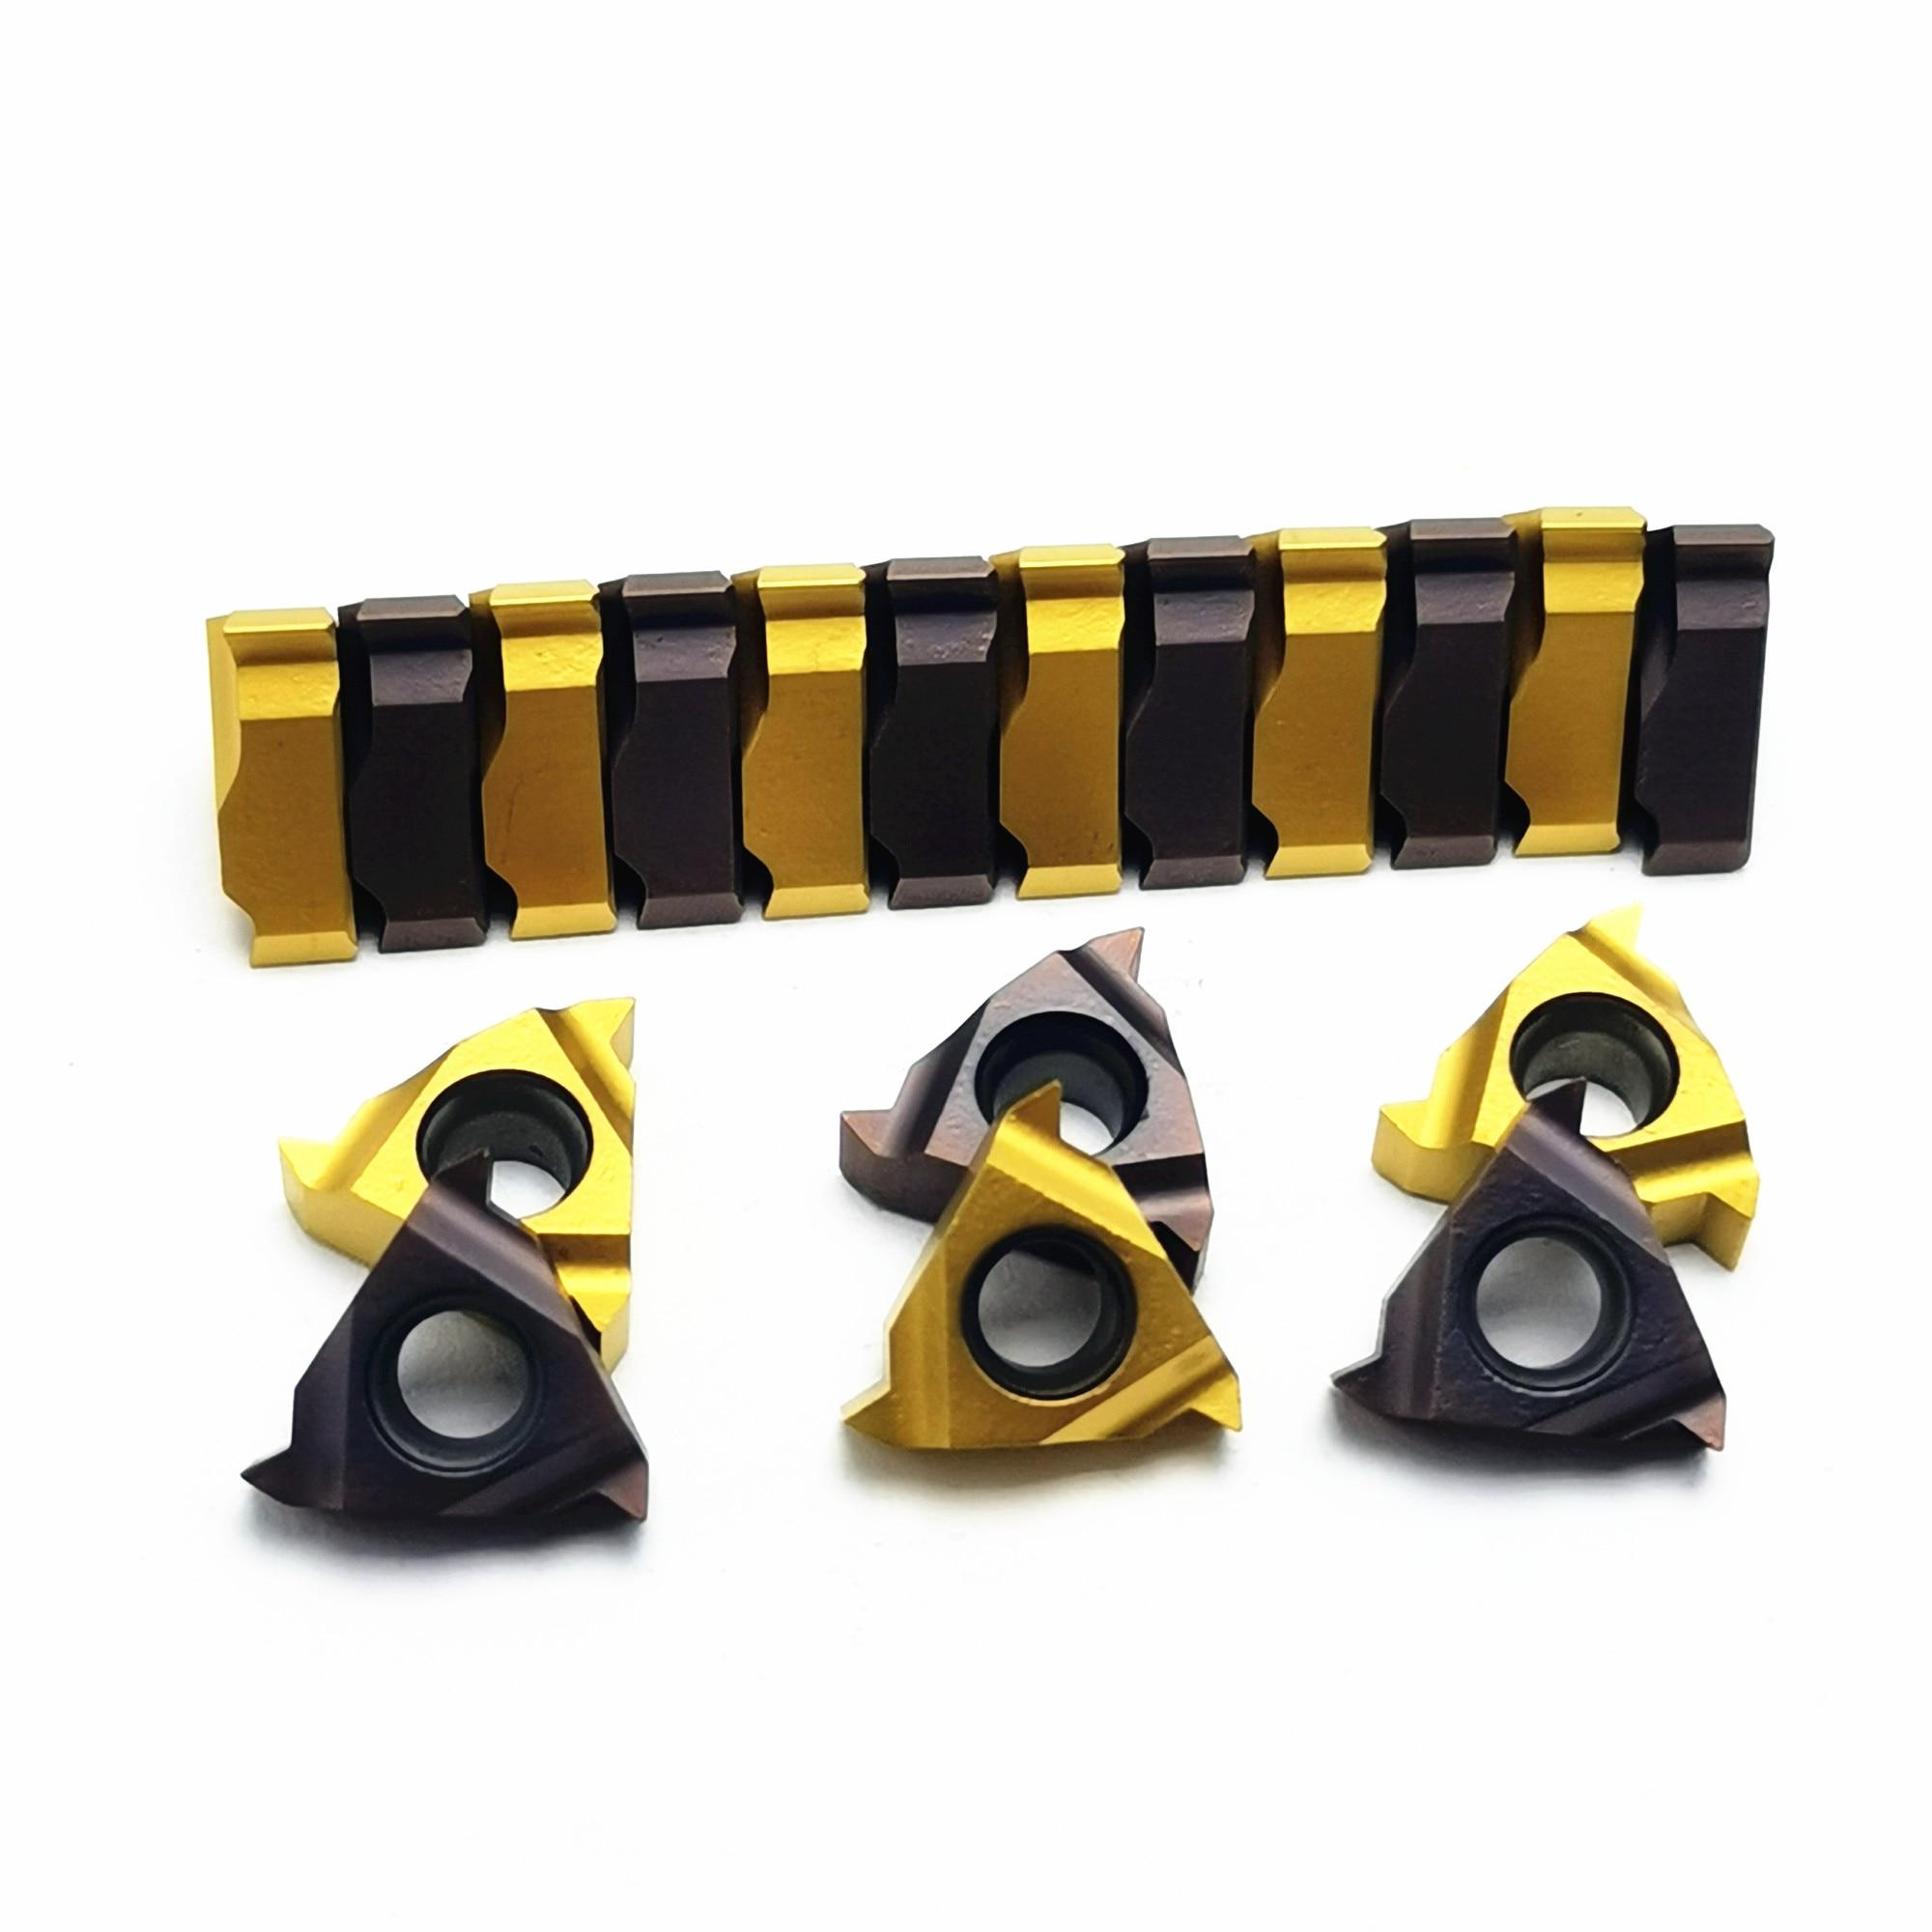 Tungsten Carbide MMT 16ER AG60 VP15TF / UE6020 / US735 Carbide Blade Thread Cutting Machine Lathe Tool Milling Cutter CNC Tool